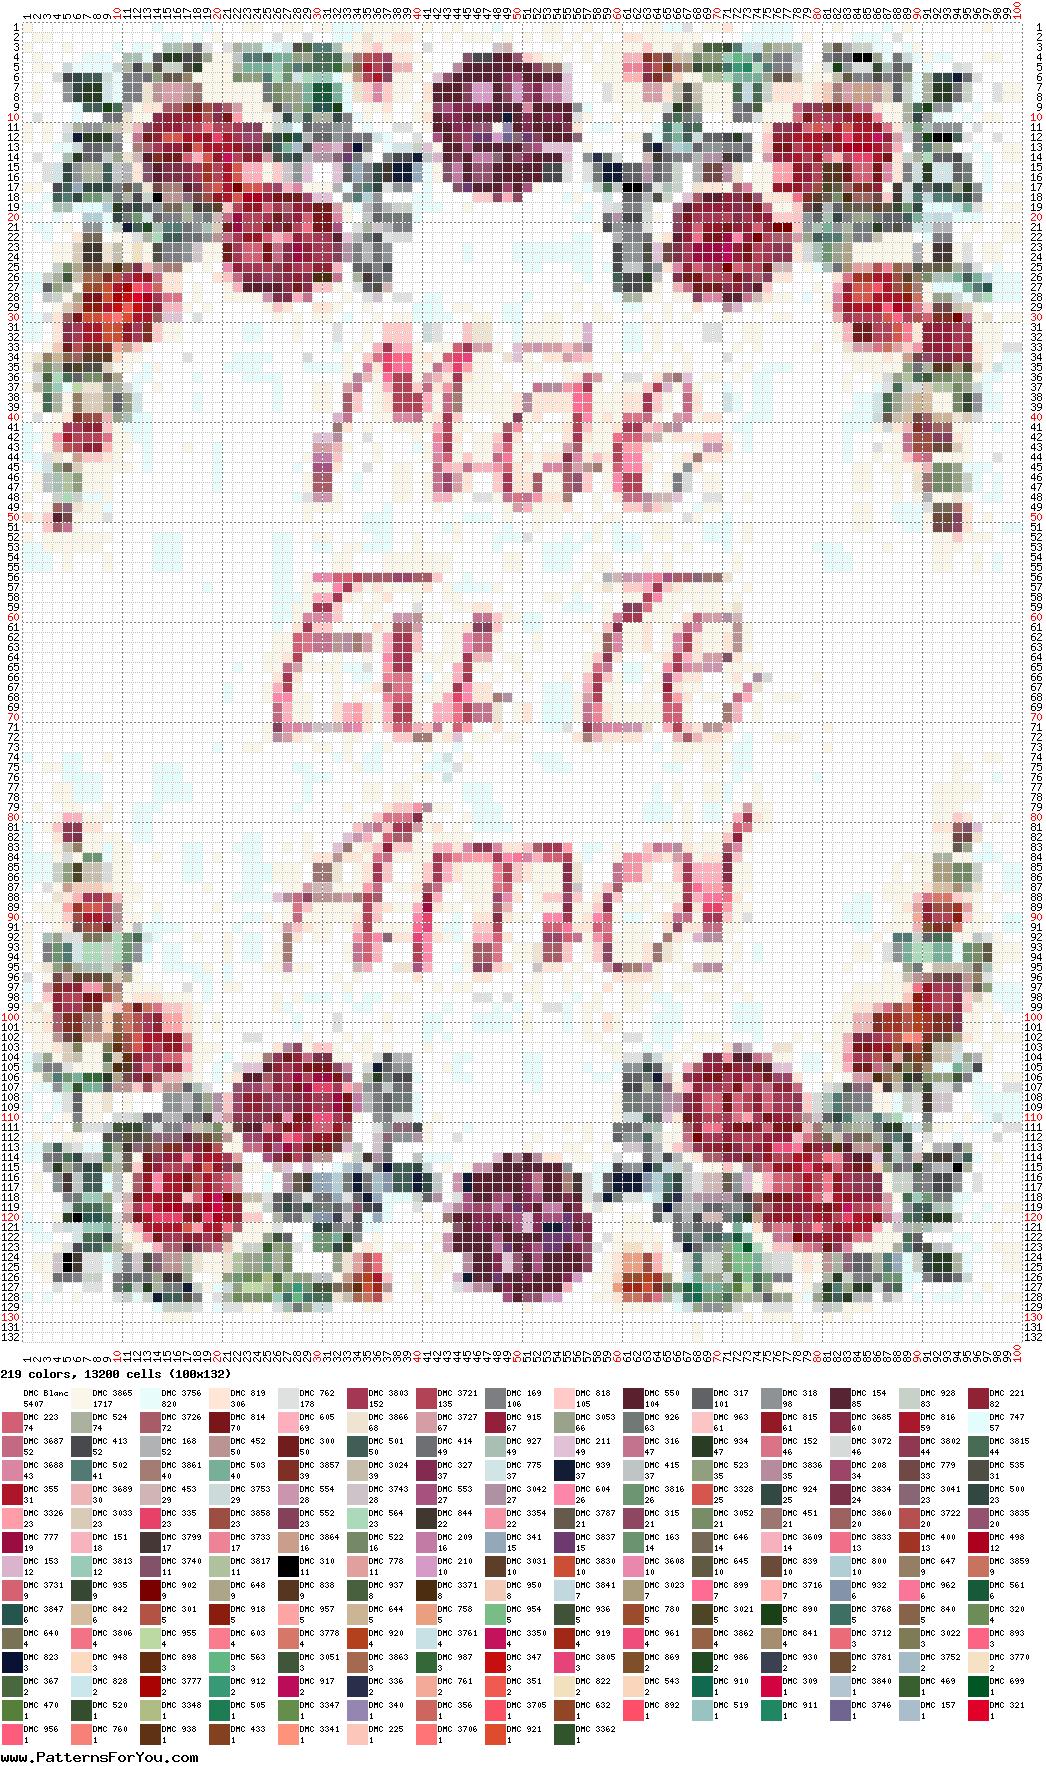 http://pfy.s3.amazonaws.com/0_5808617154bba497267b32_pattern_294308.png